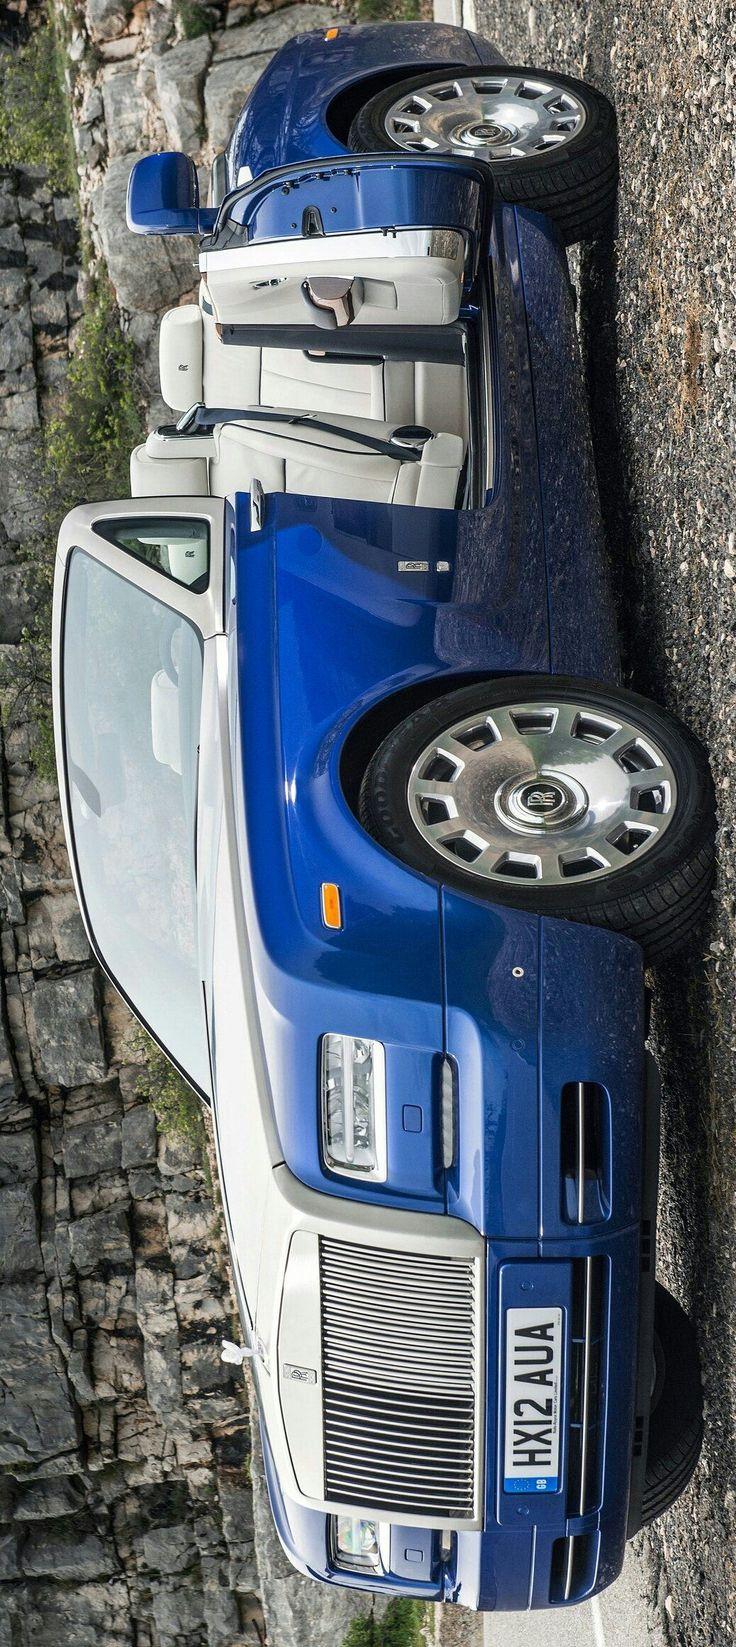 Rolls Royce Phantom Drophead Coupe by Levon